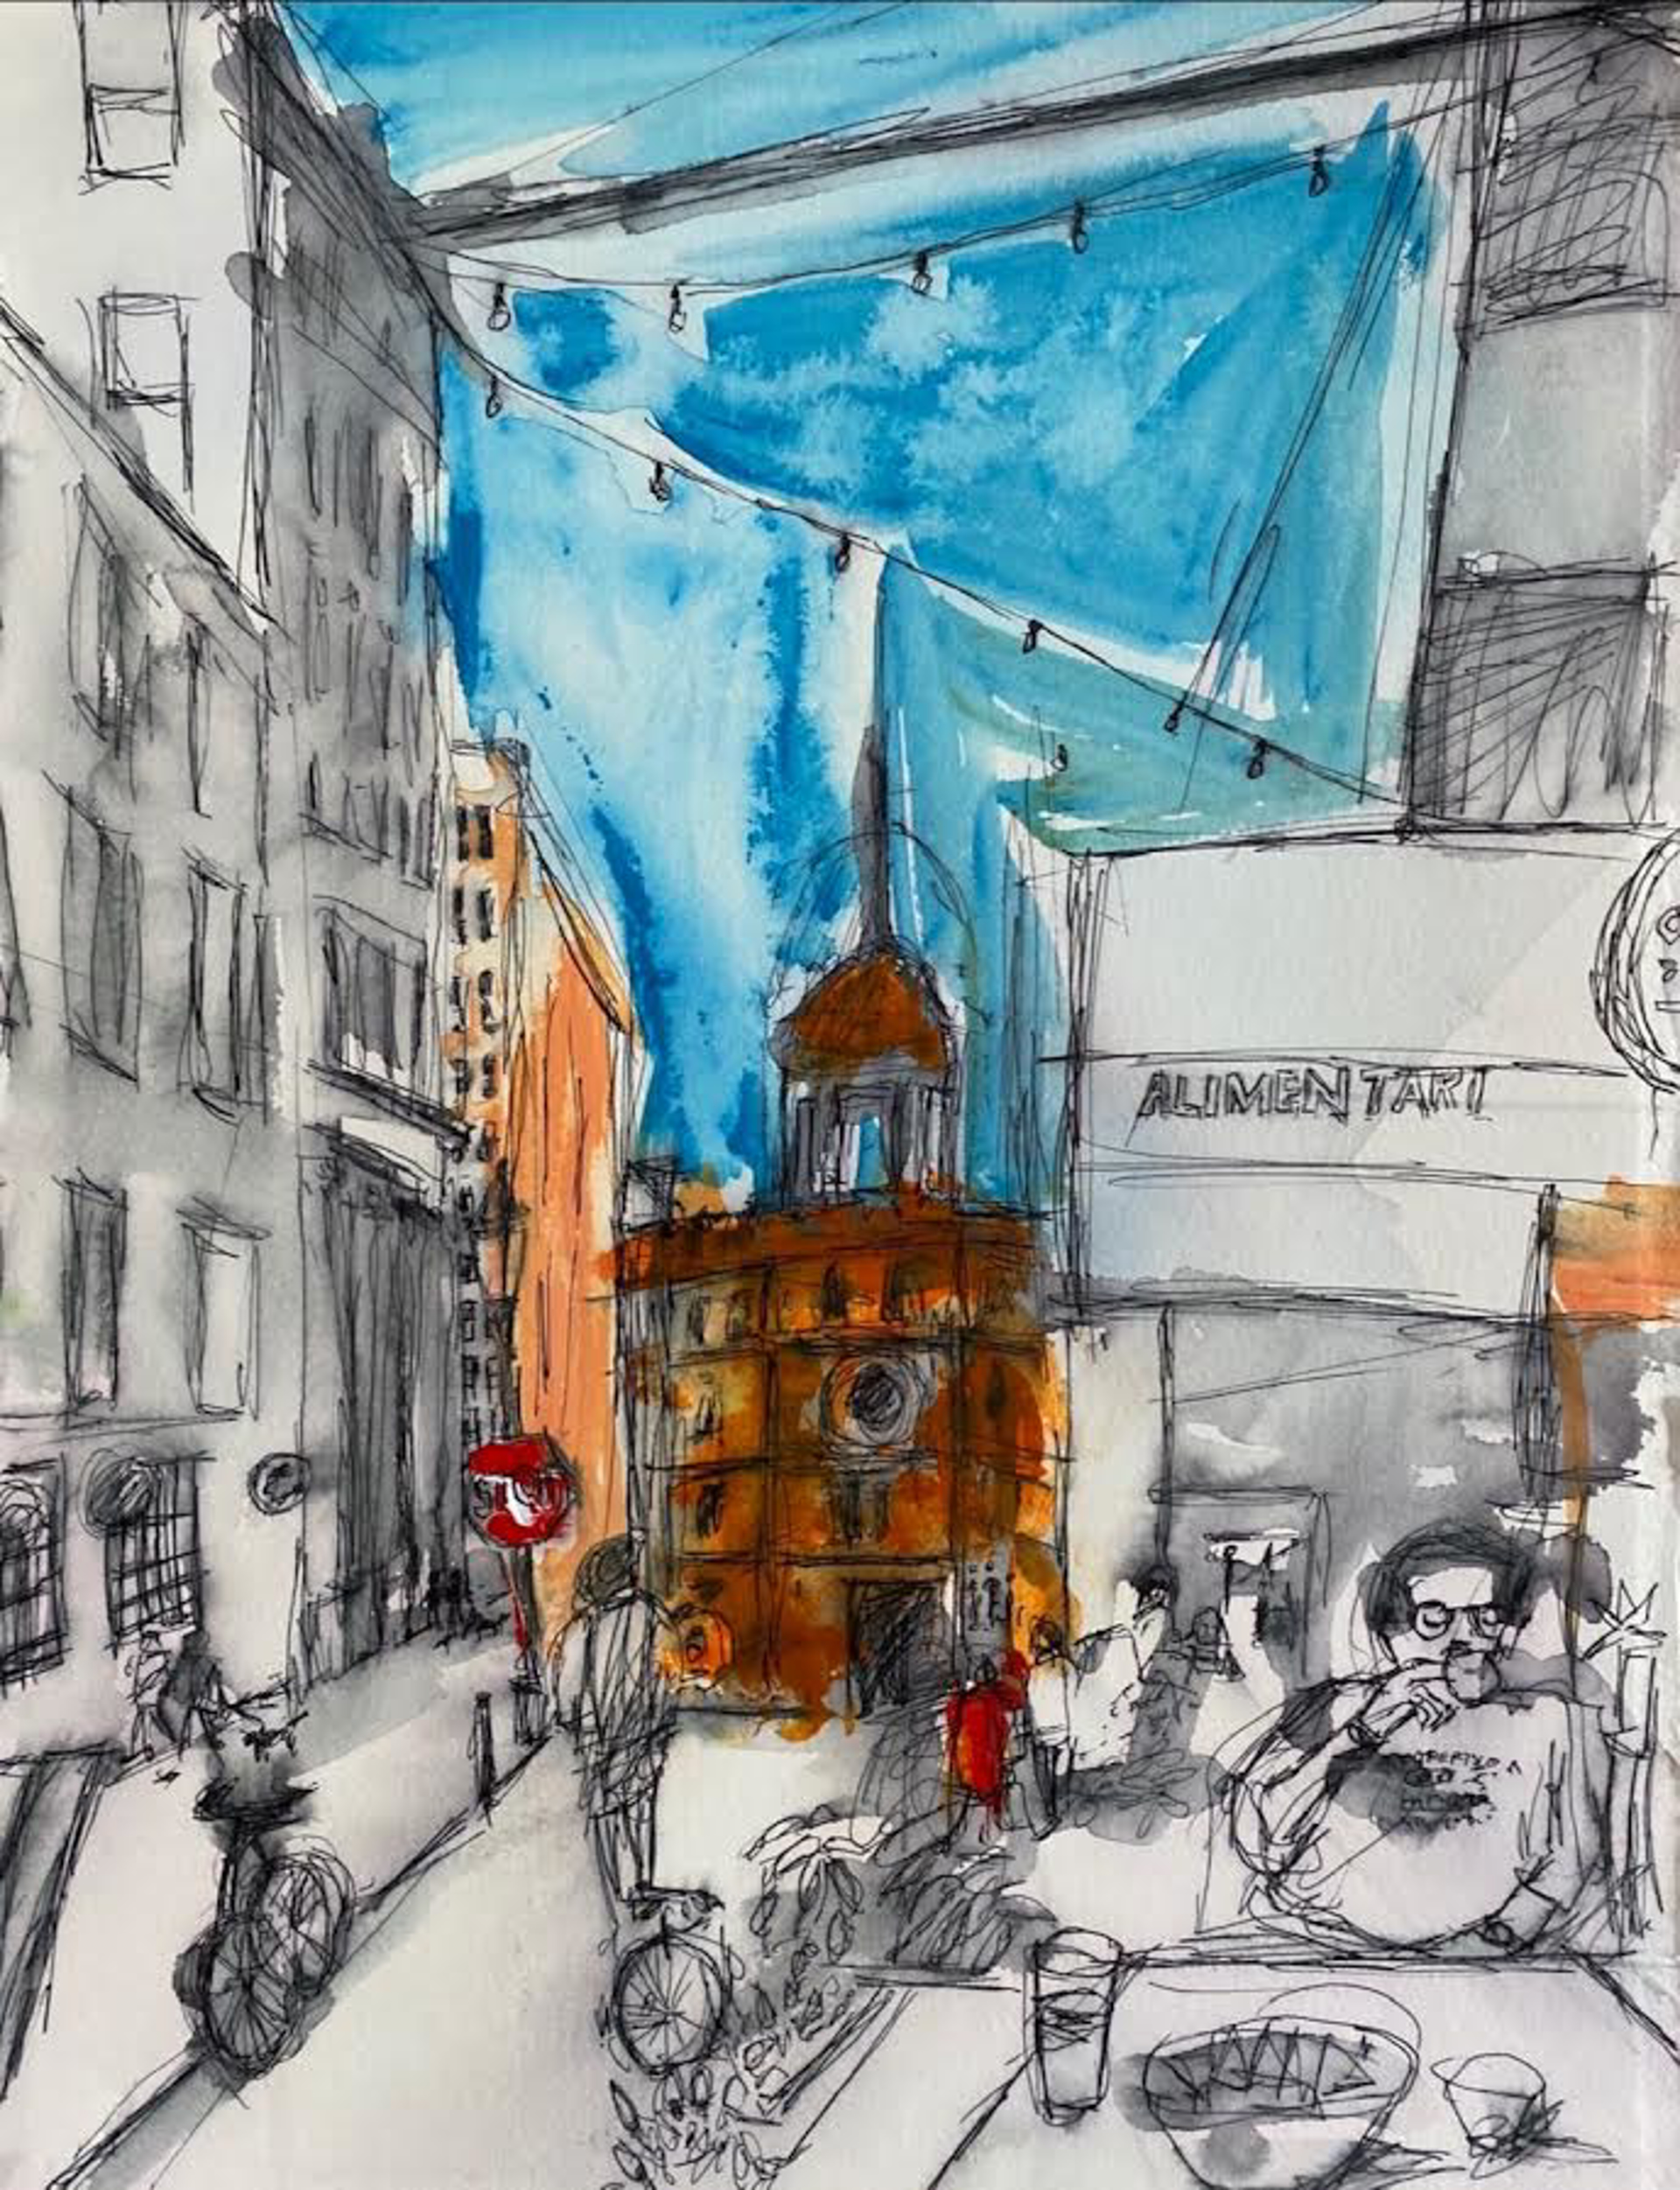 8th and Market by Ana Guzman